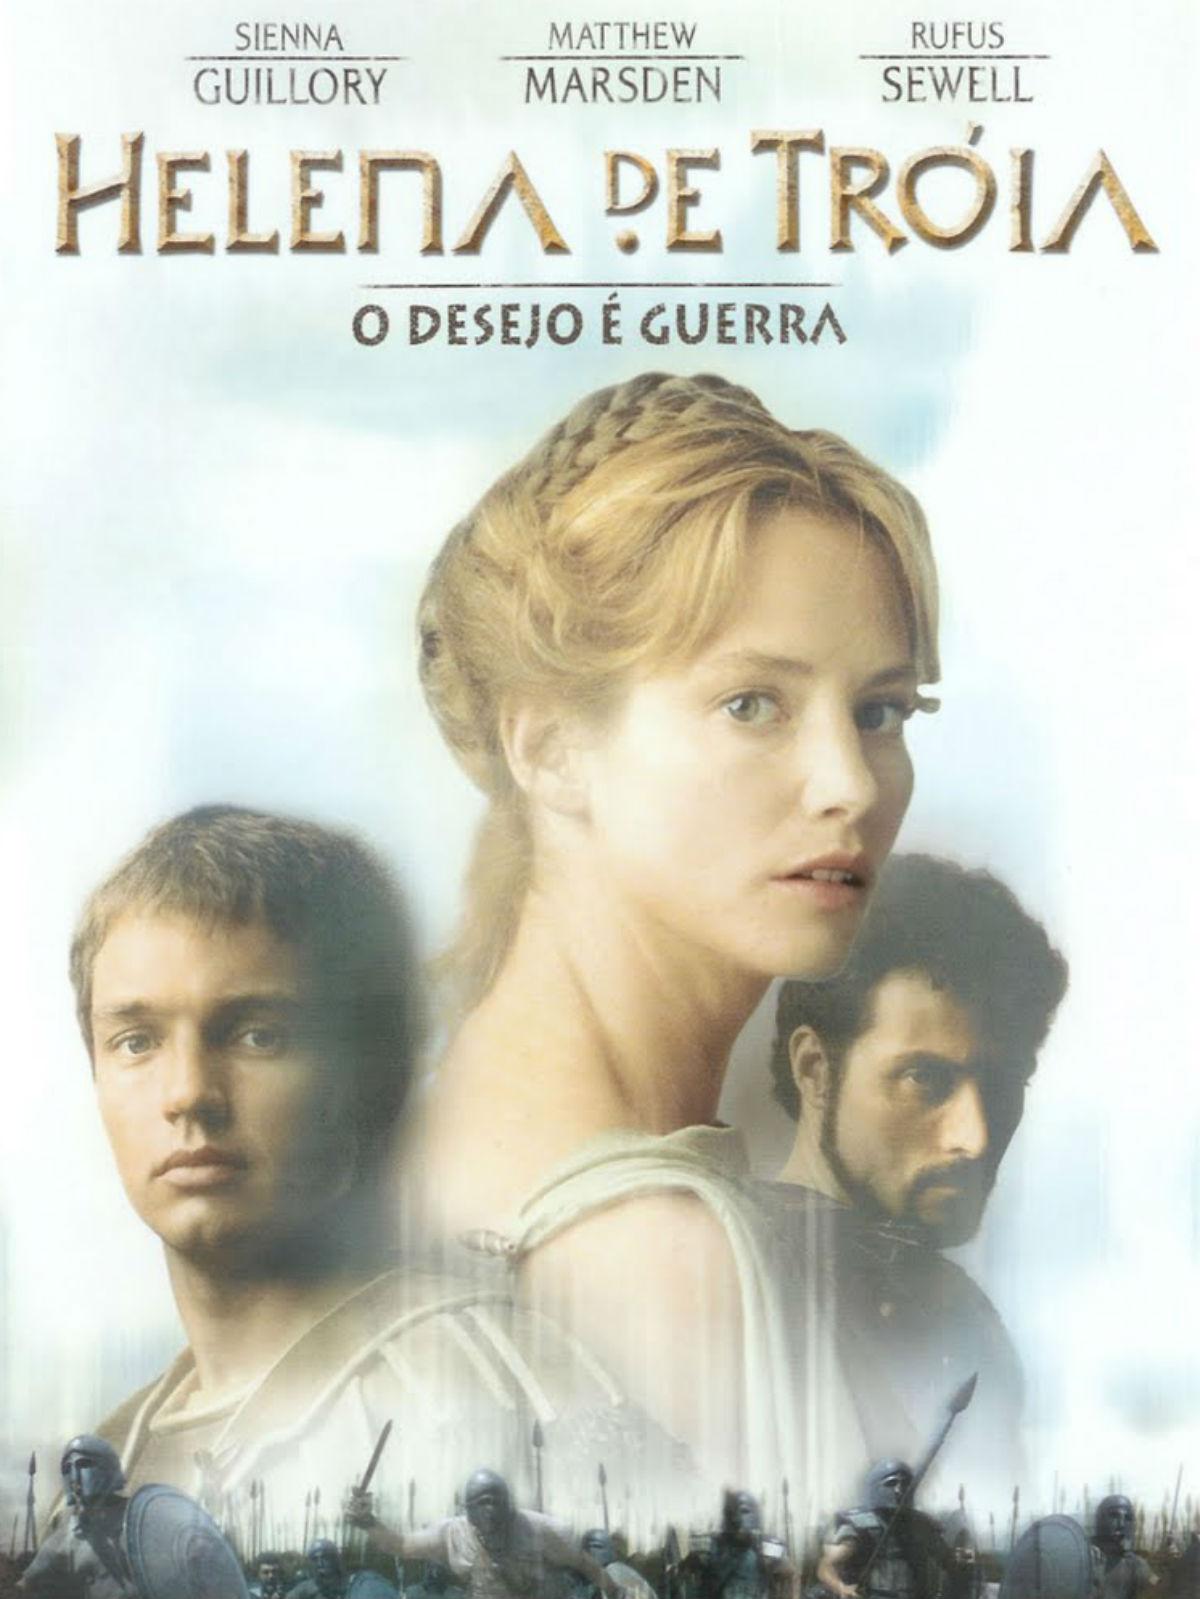 Tróia filme 2004 adorocinema.